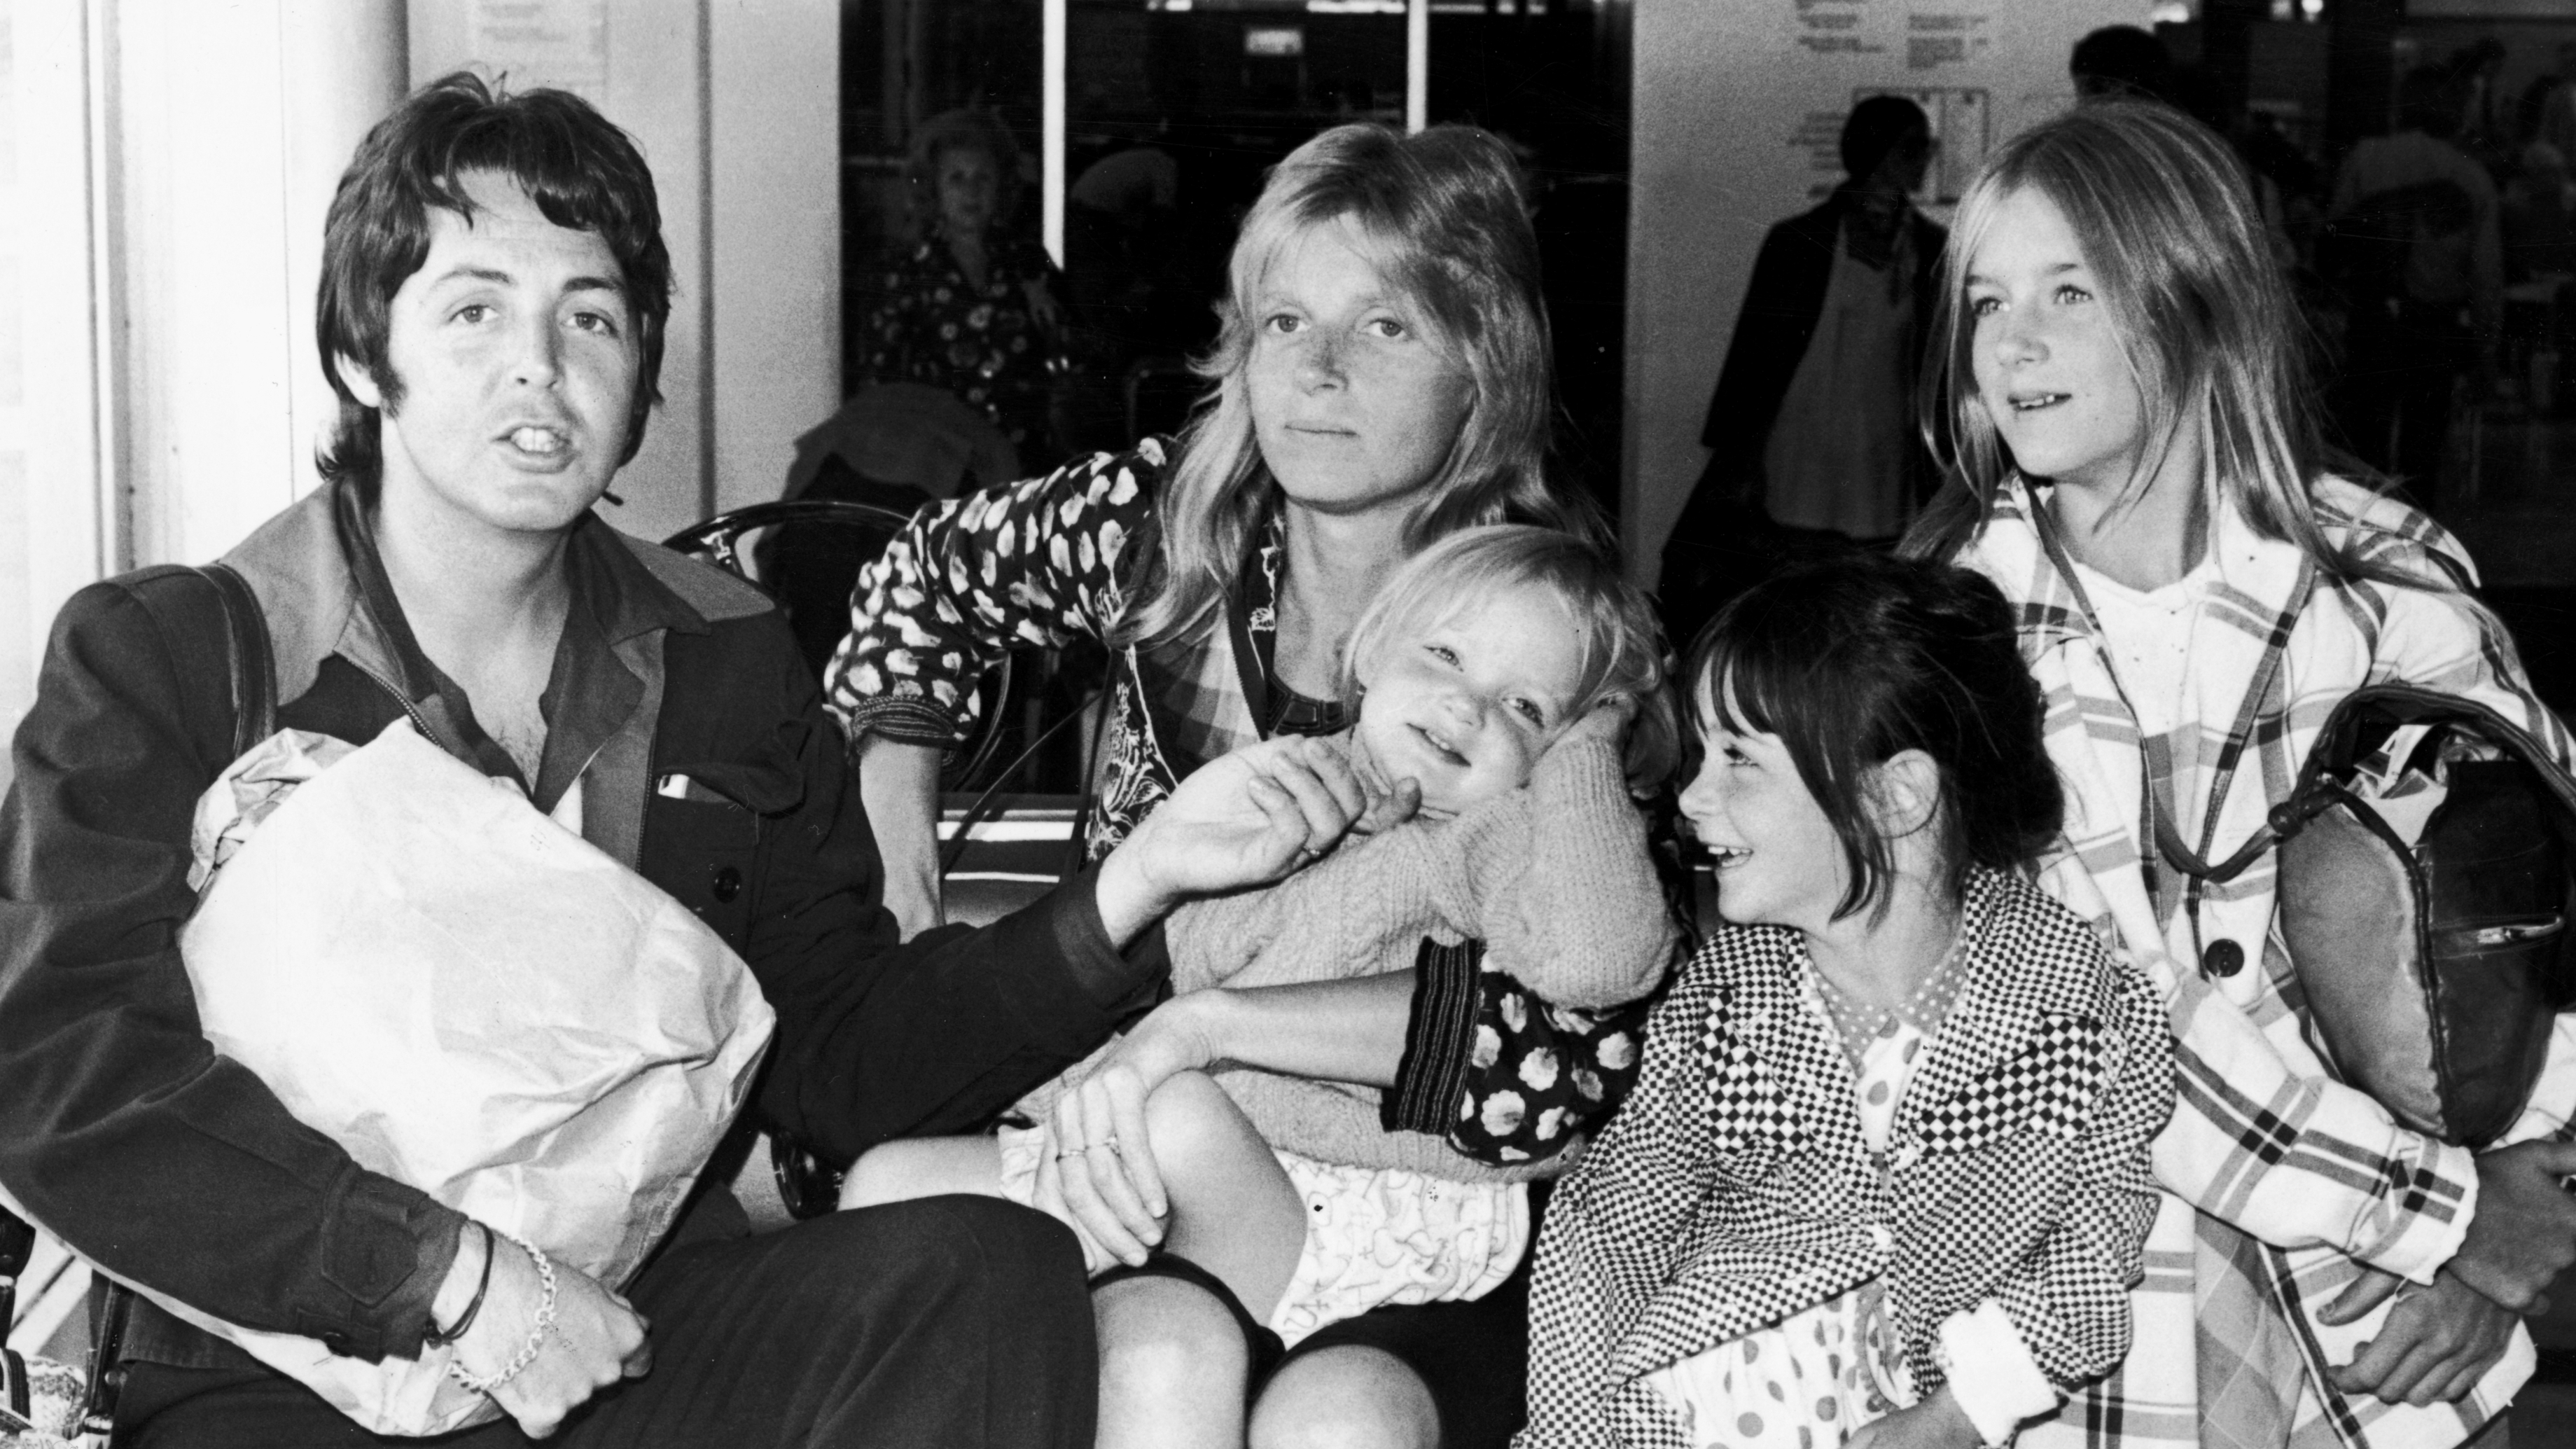 Paul Mccartney S Children Meet Beatles Singer S 4 Daughters And 1 Son